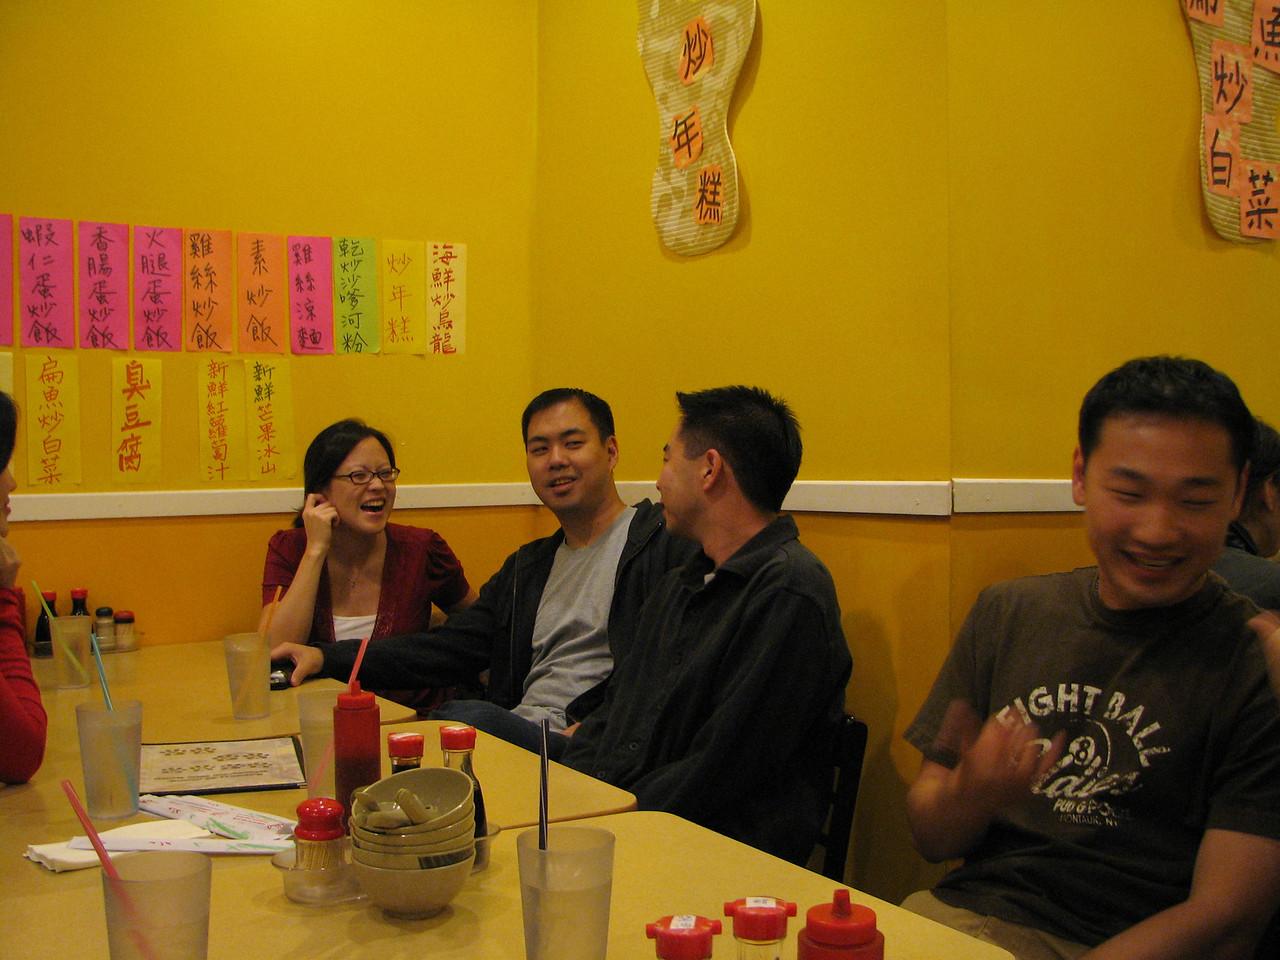 2006 10 29 Sun - Cathy & Harry Huang, Henry Peng, & Terrence Han